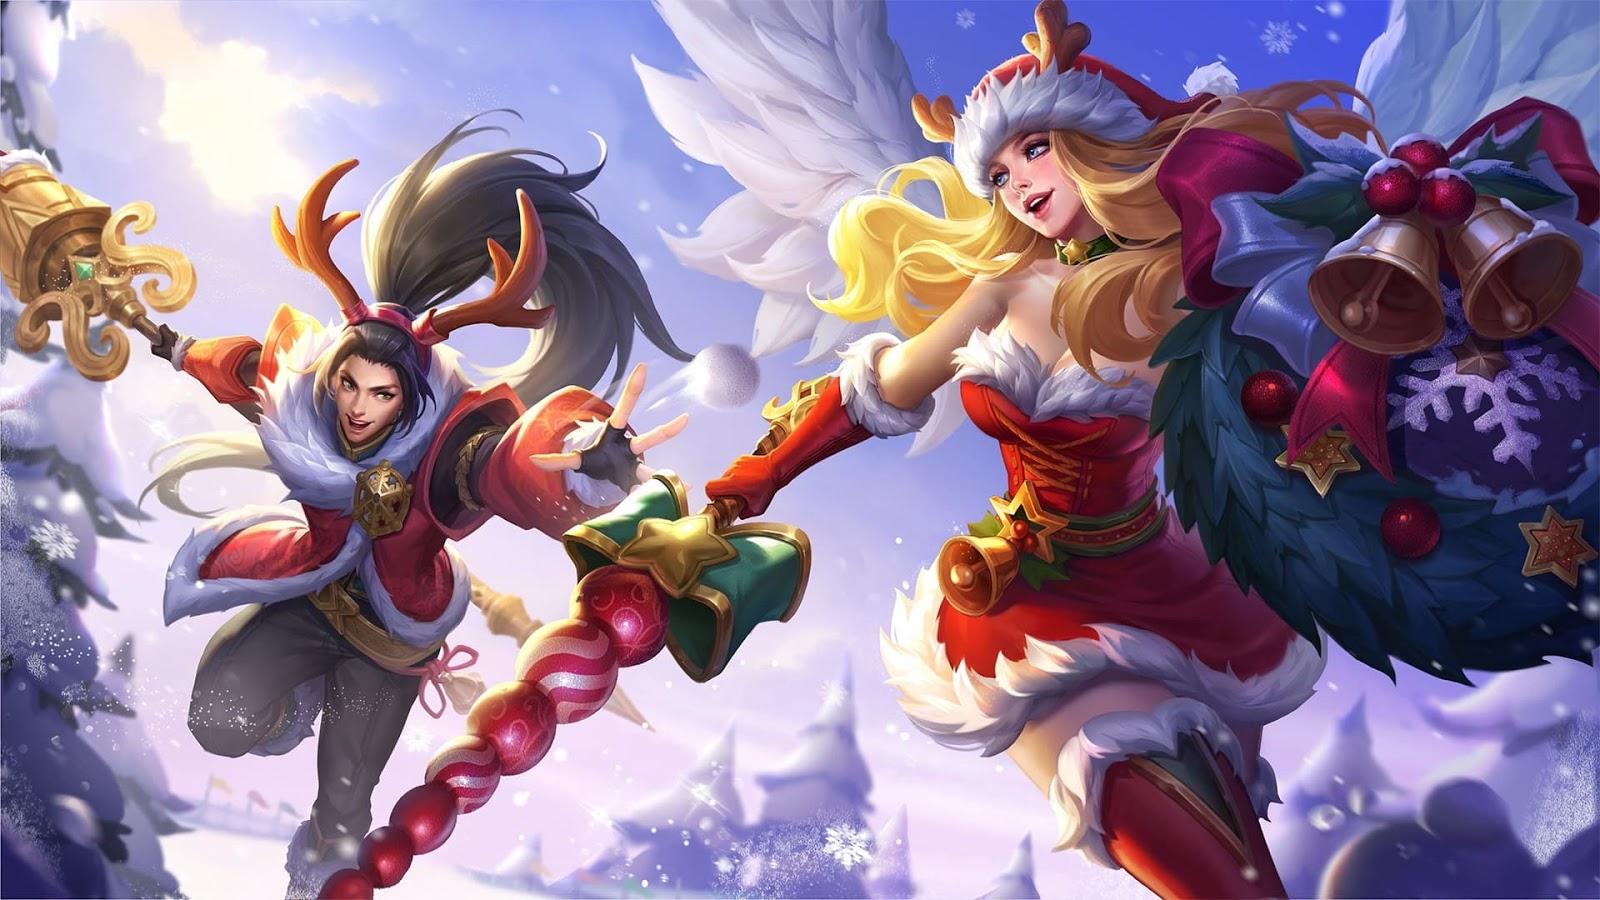 Wallpaper Zilong and Freya Christmas Carnival Skin Mobile Legends Full HD for PC